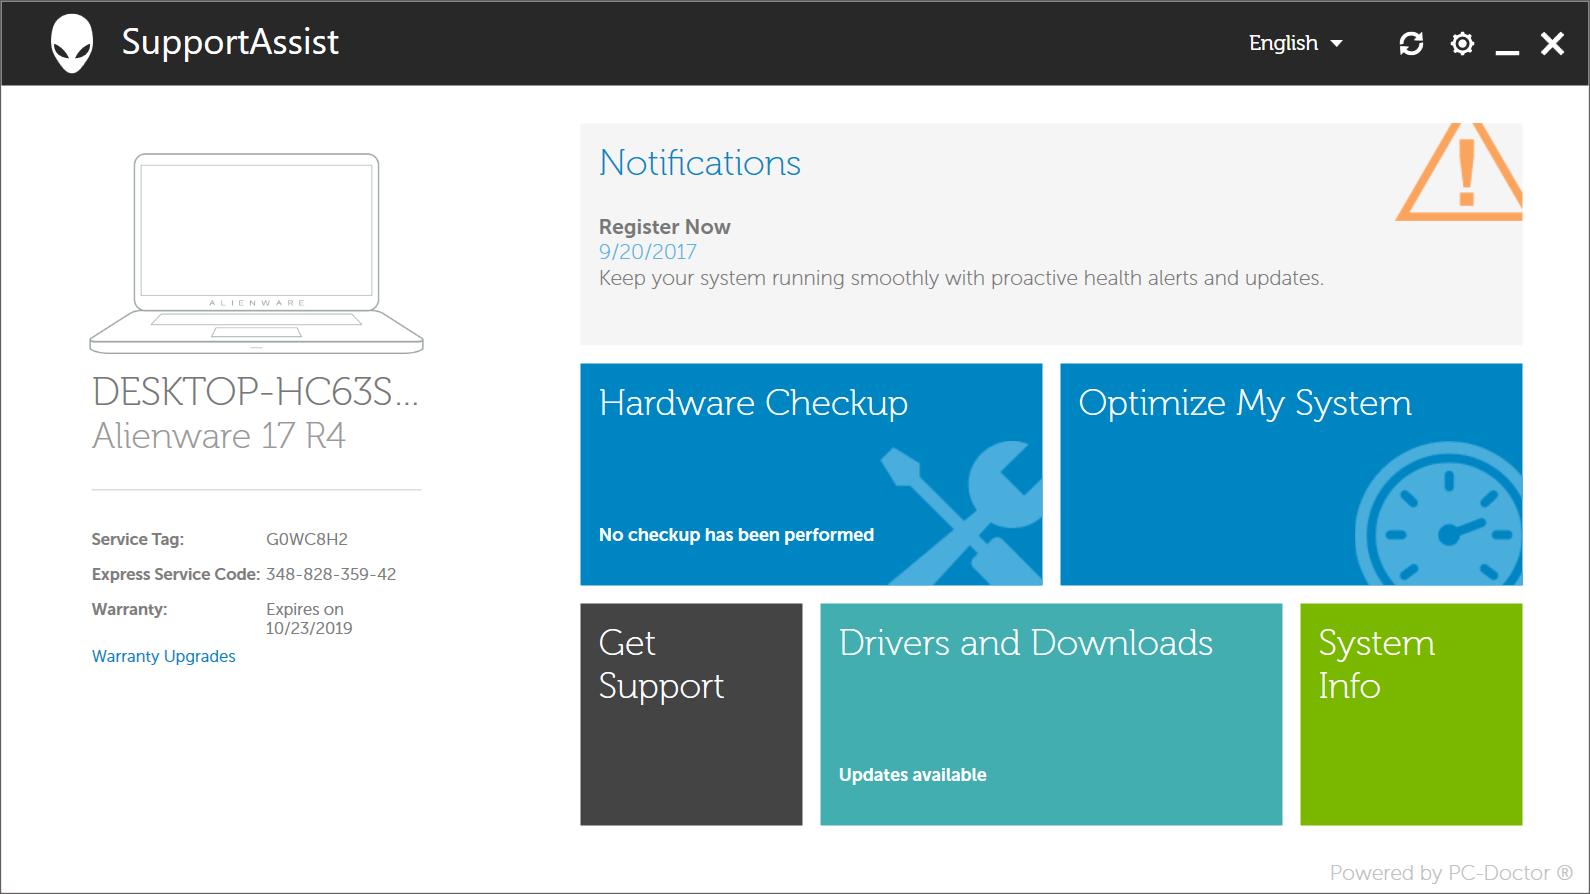 Review] Dell Alienware 17 R4 โน้ตบุ๊คเล่นเกมตัวท็อป